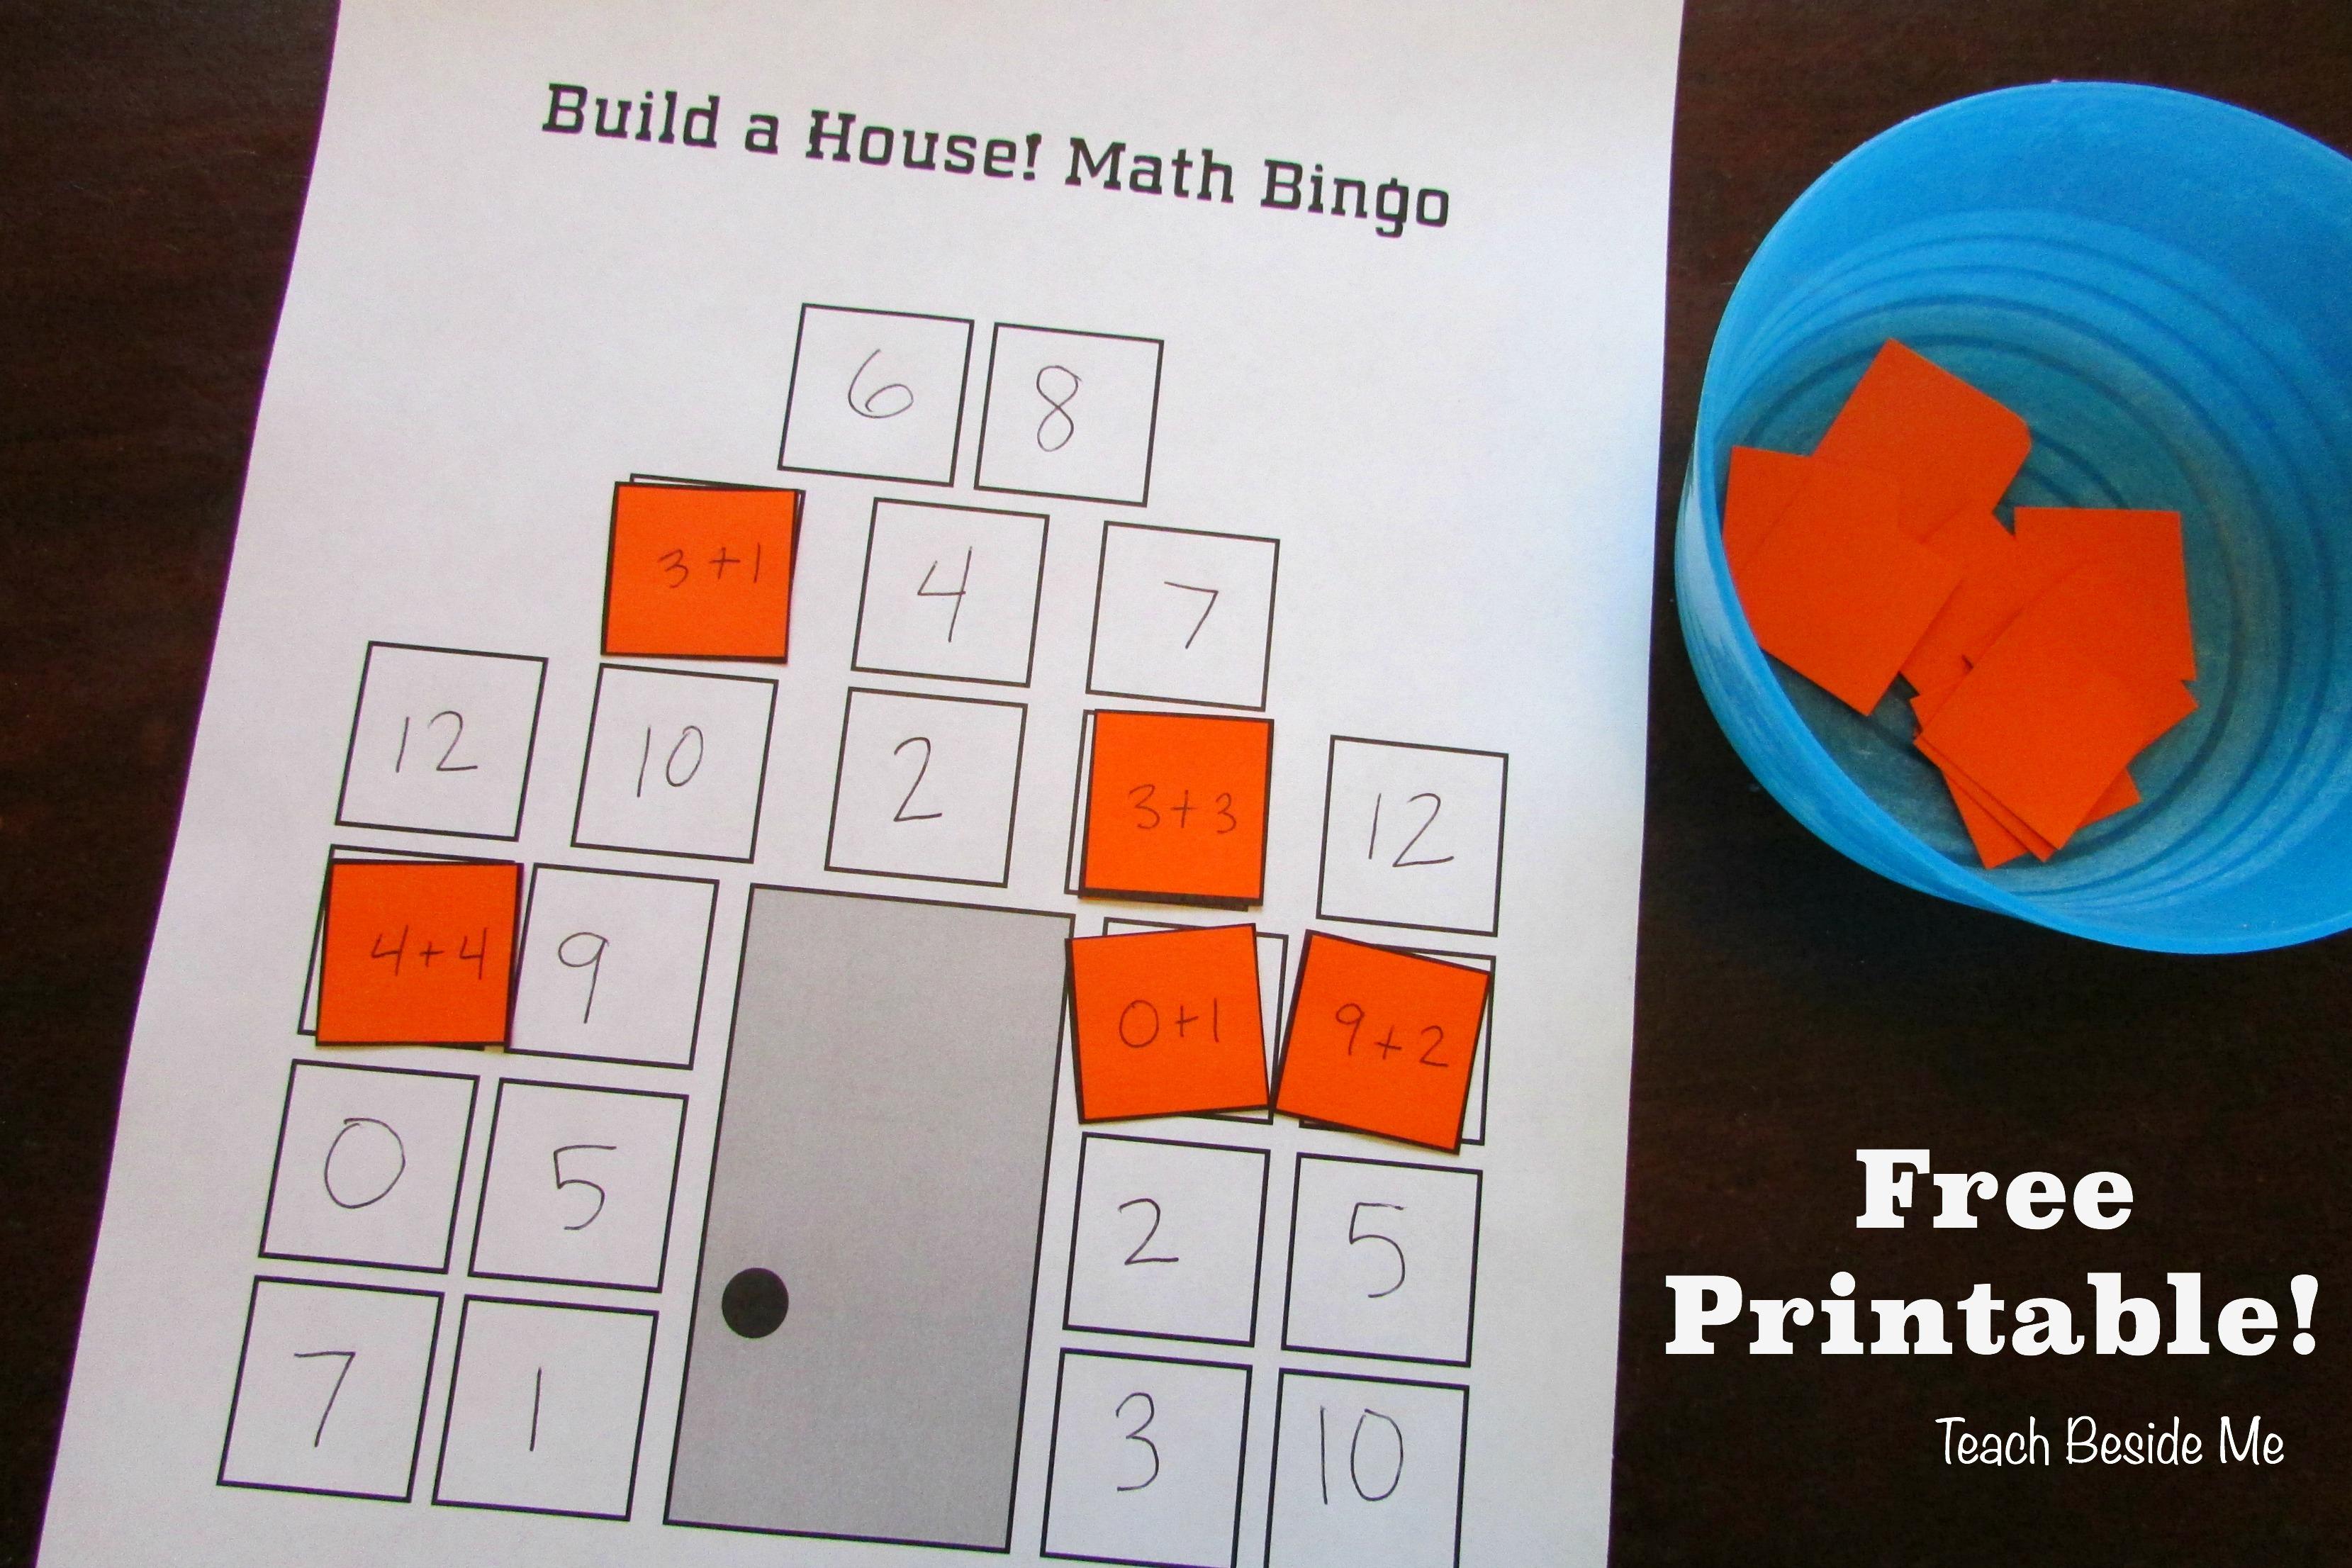 Build-A-House Math Bingo – Free Printable – Teach Beside Me - Math Bingo Free Printable